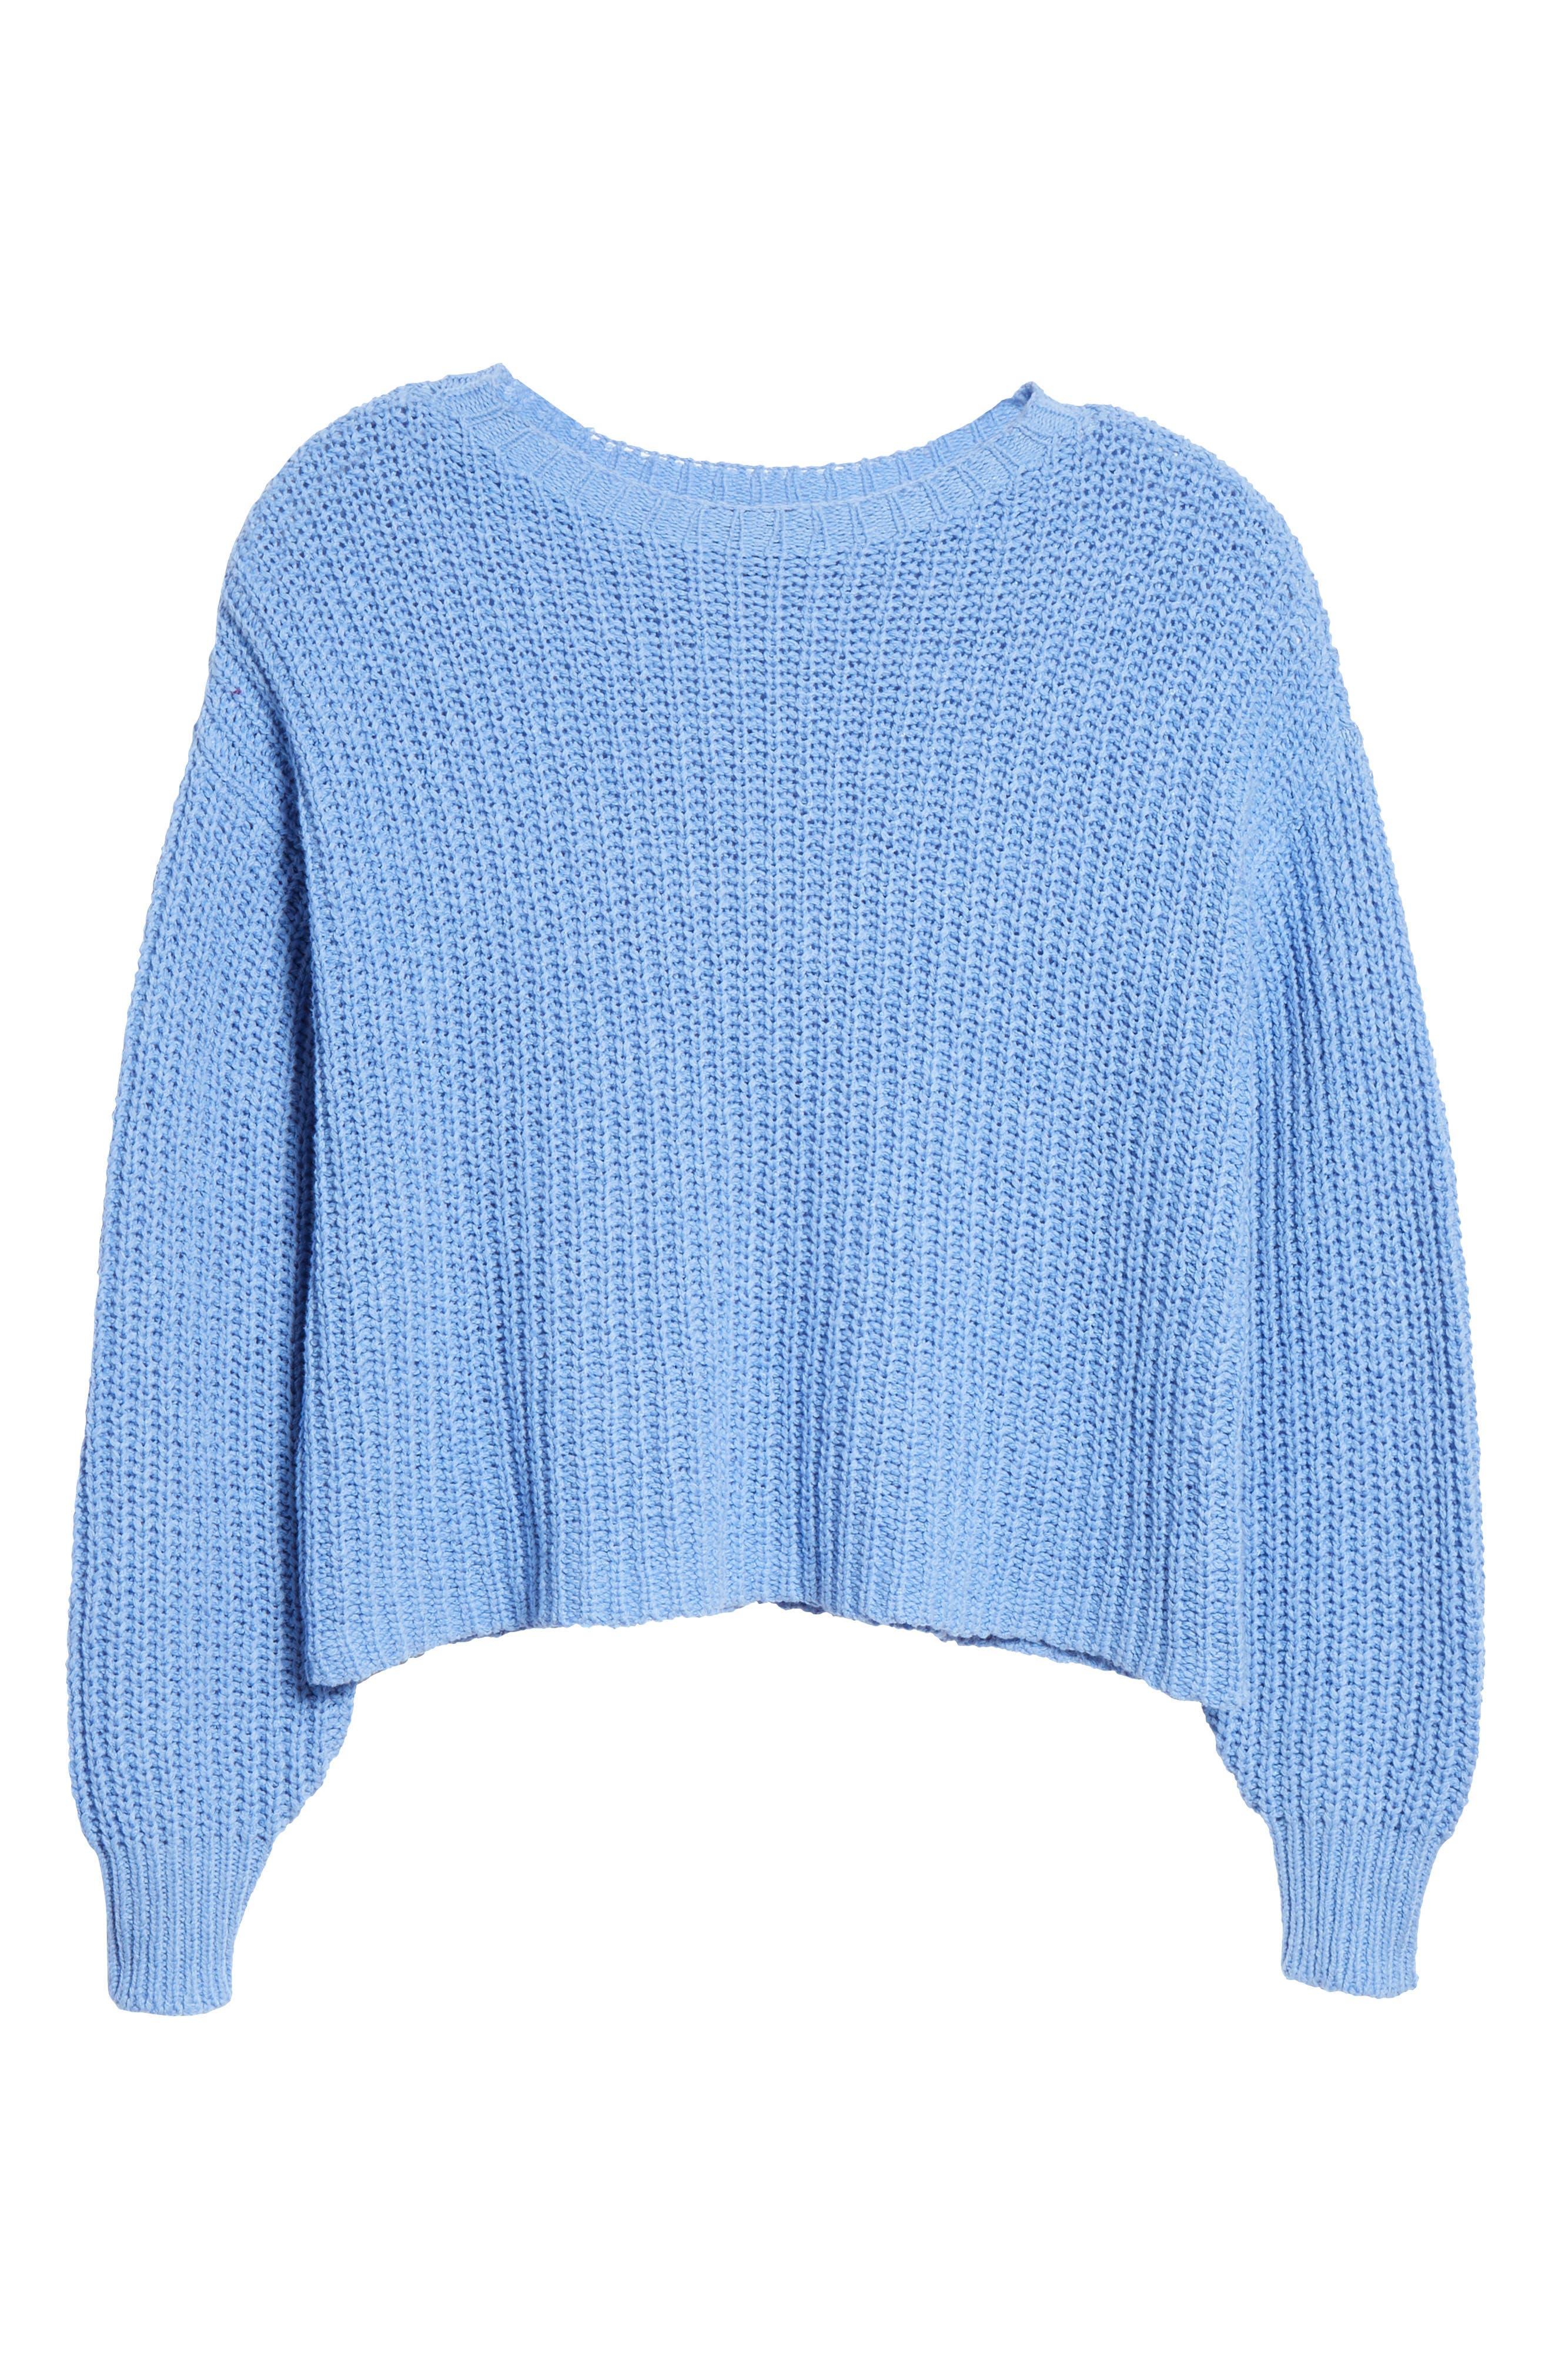 EILEEN FISHER,                             Crewneck Crop Shaker Sweater,                             Alternate thumbnail 6, color,                             BLUEBIRD